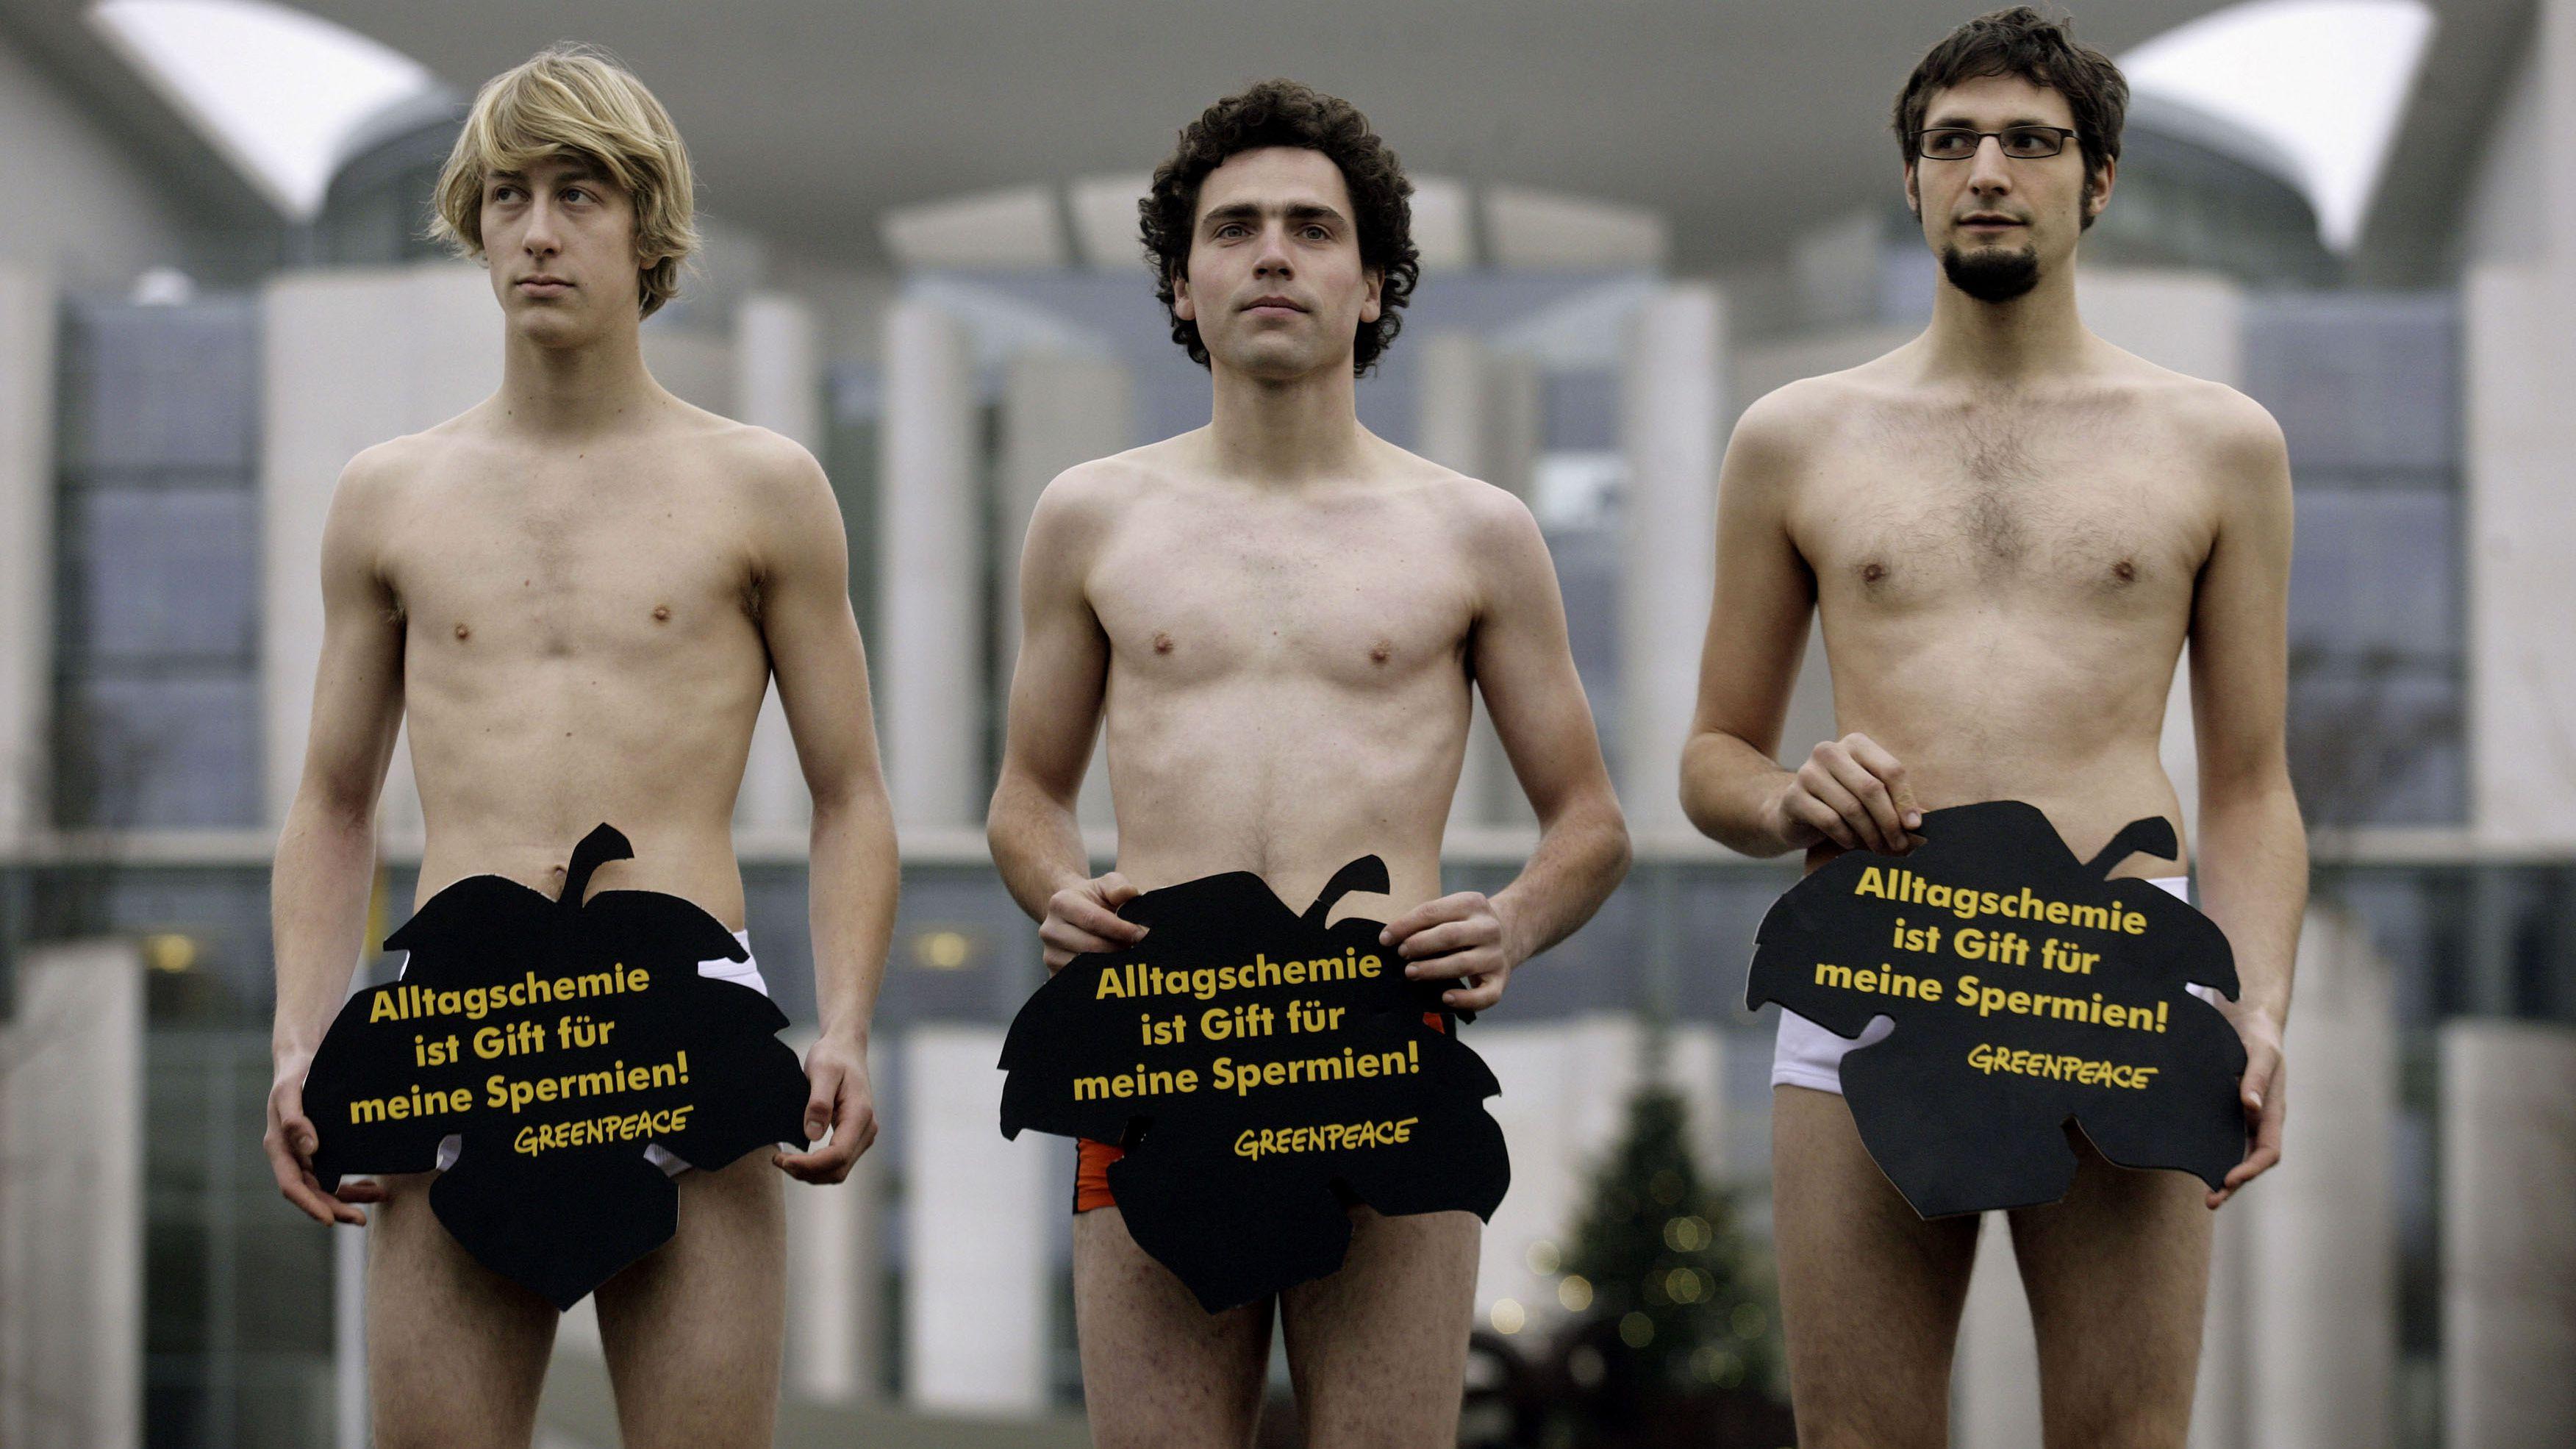 Sperm protestors